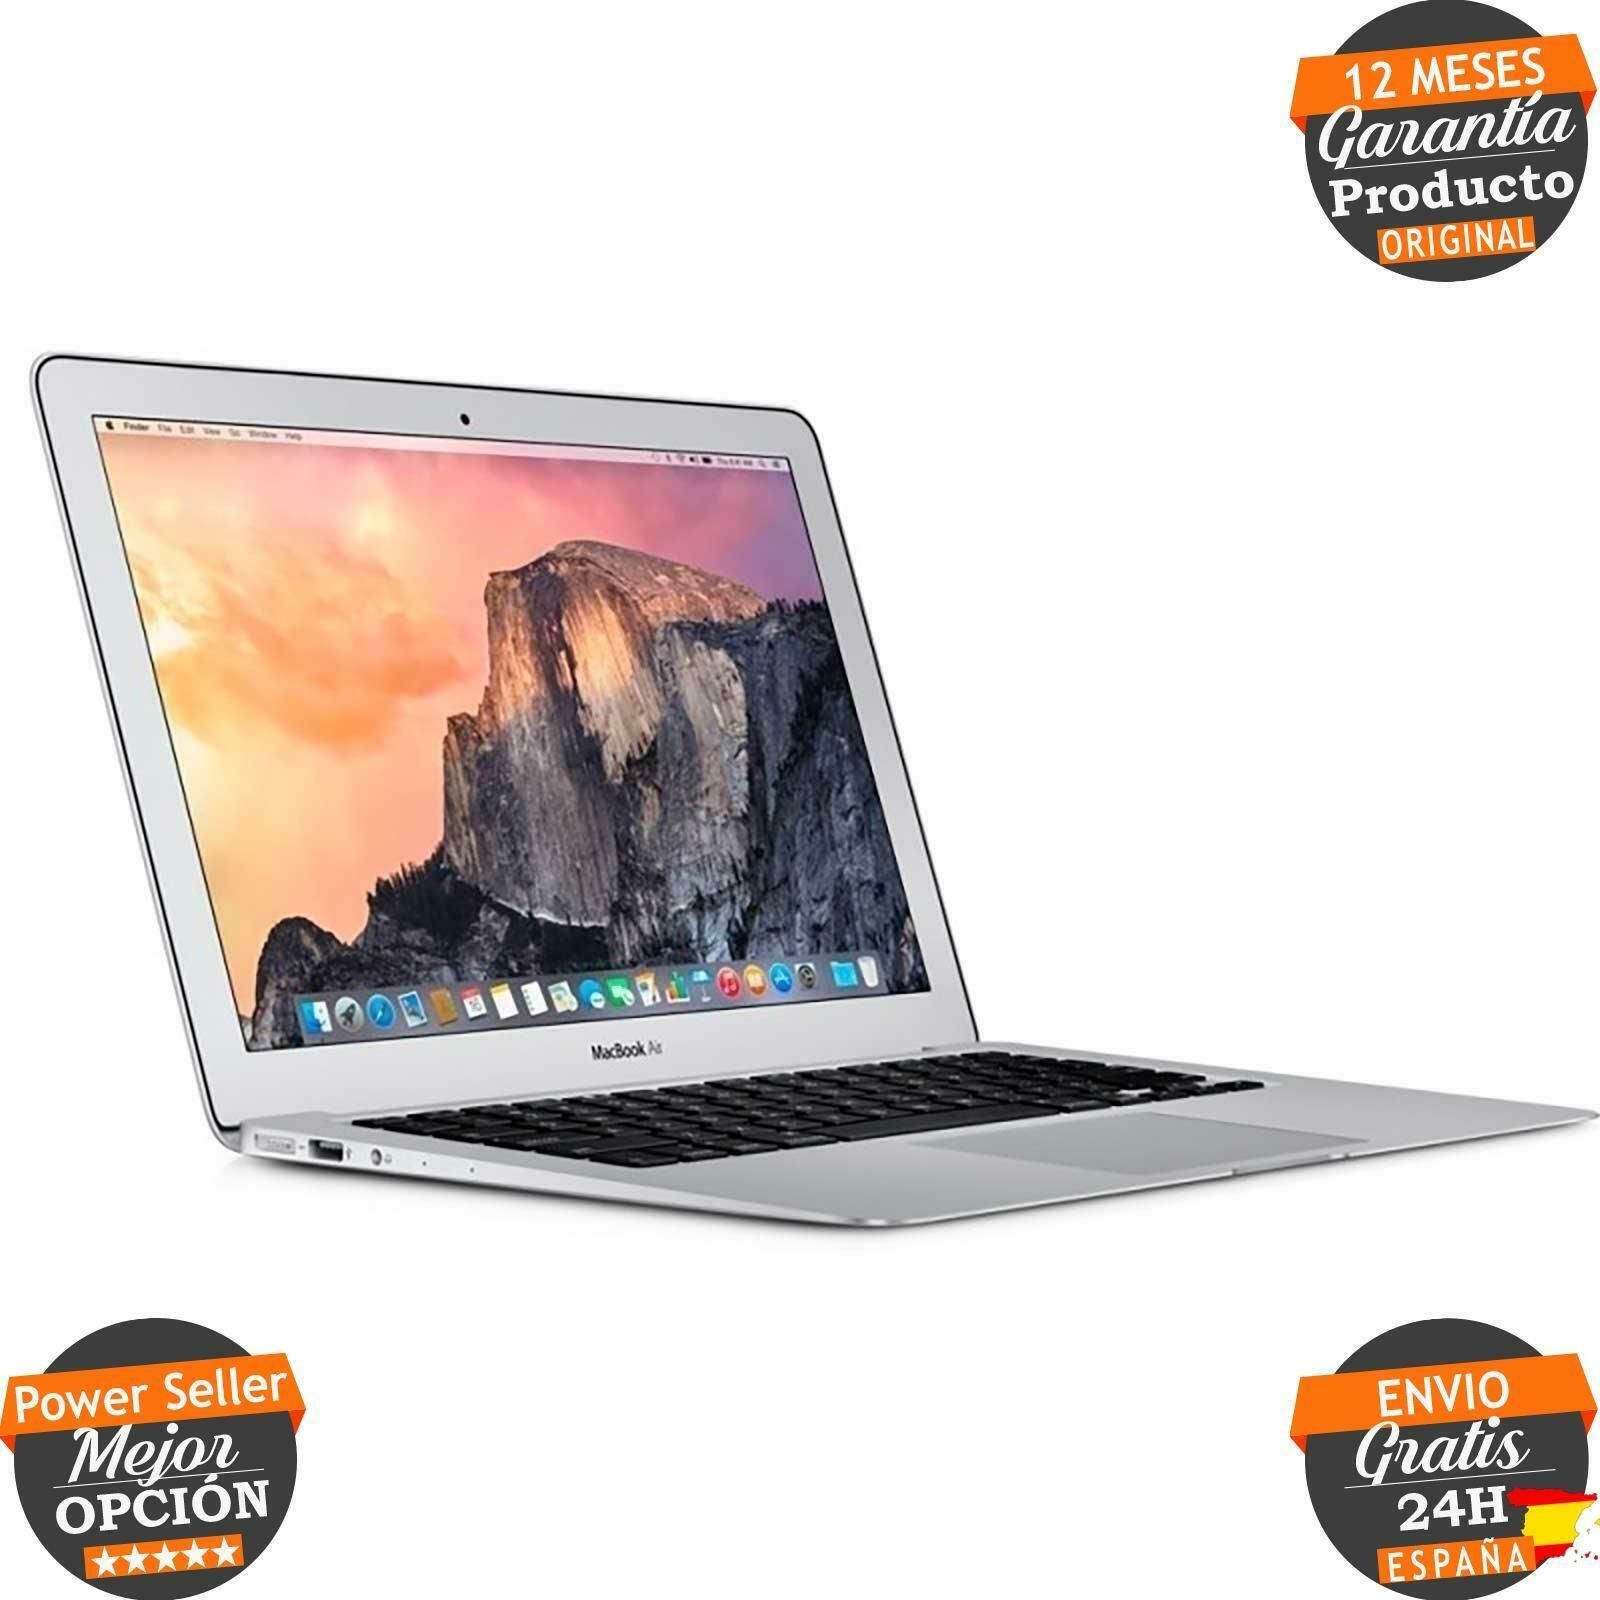 Apple Macbook Air 13 Early 2014 A1466 i5 4GB 128GB SSD